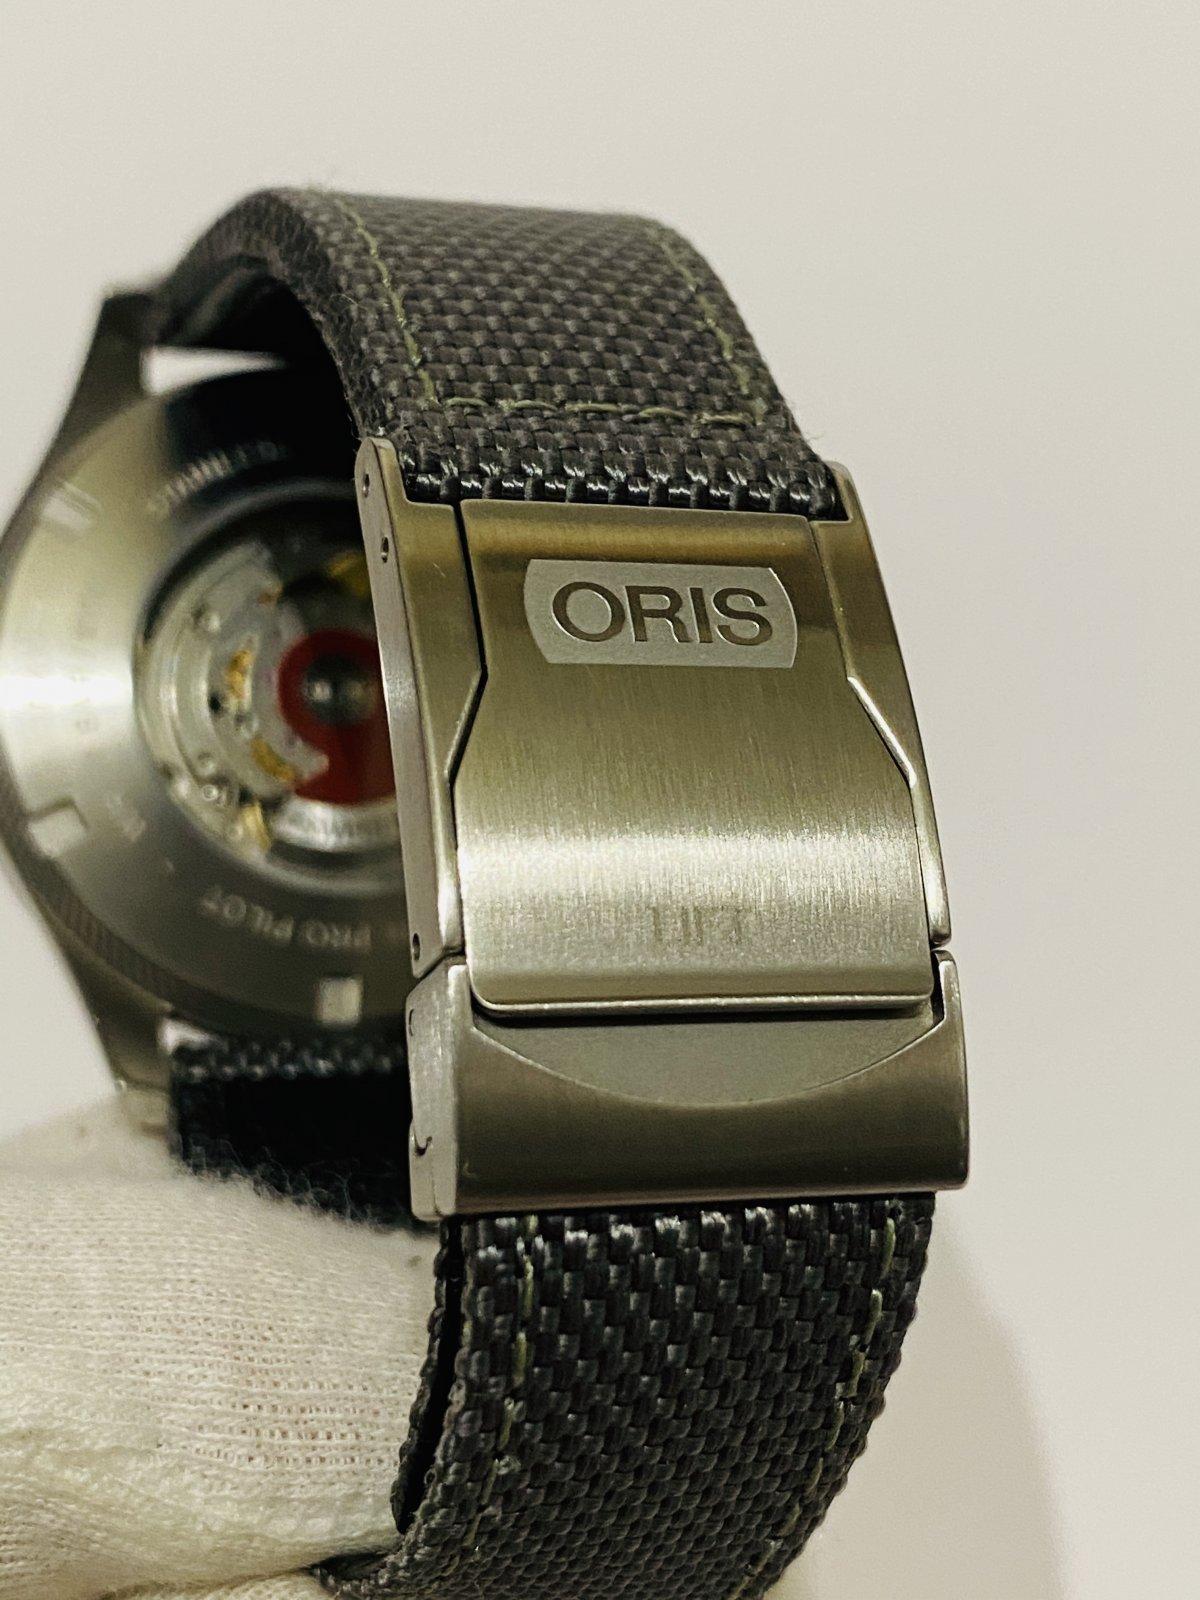 09_ORIS.jpg